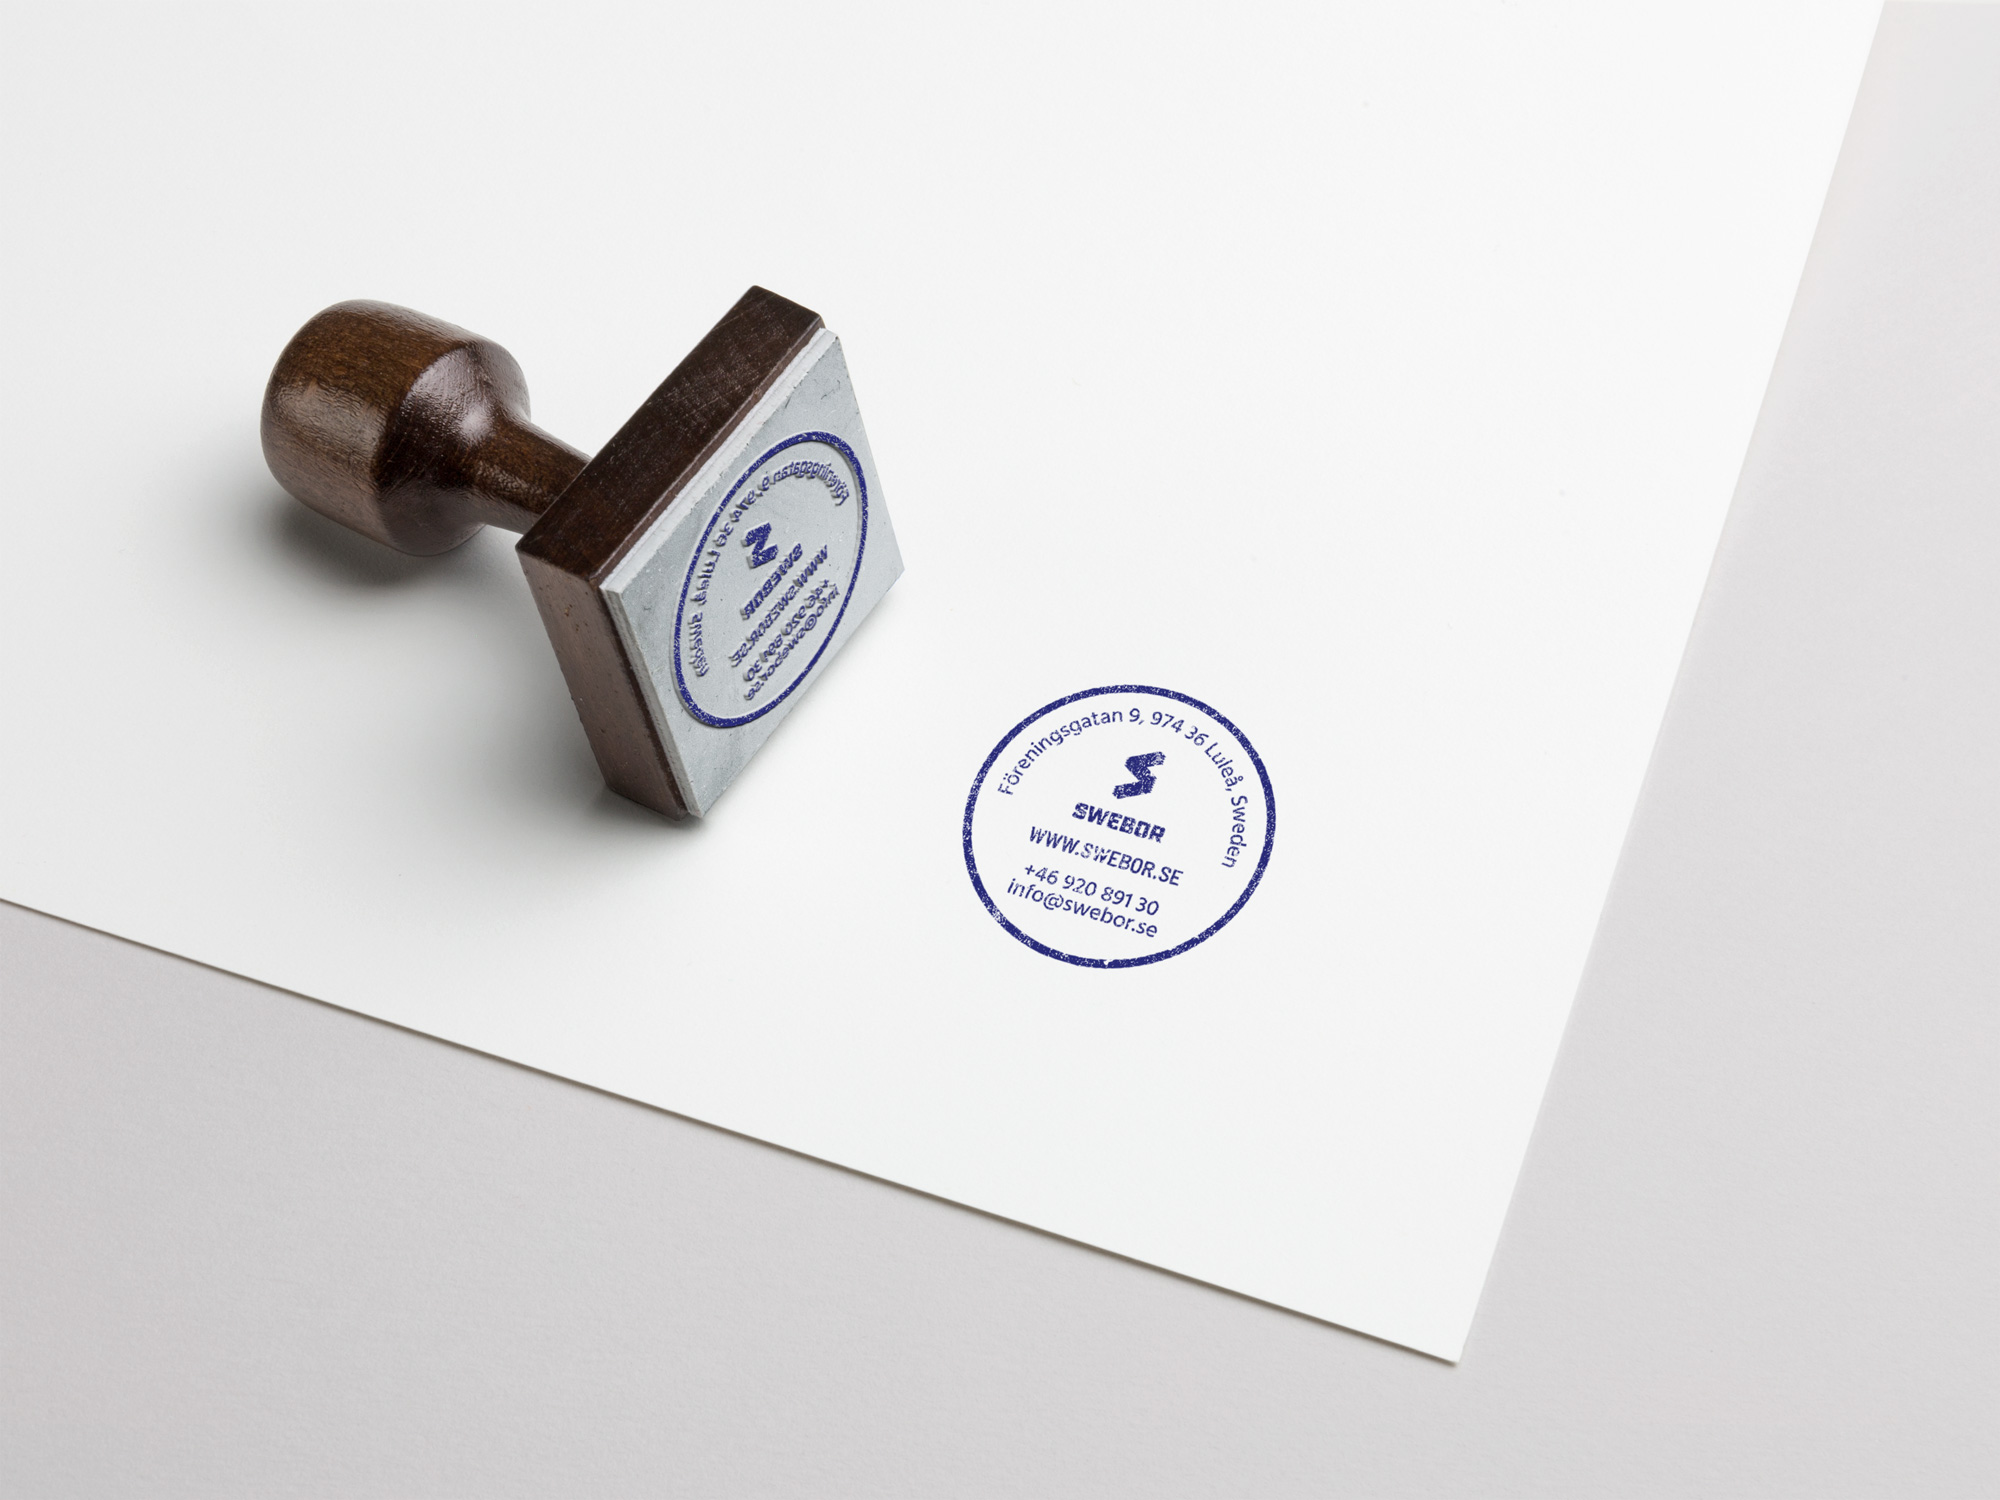 Swebor-stamp-3DMockUp.jpg